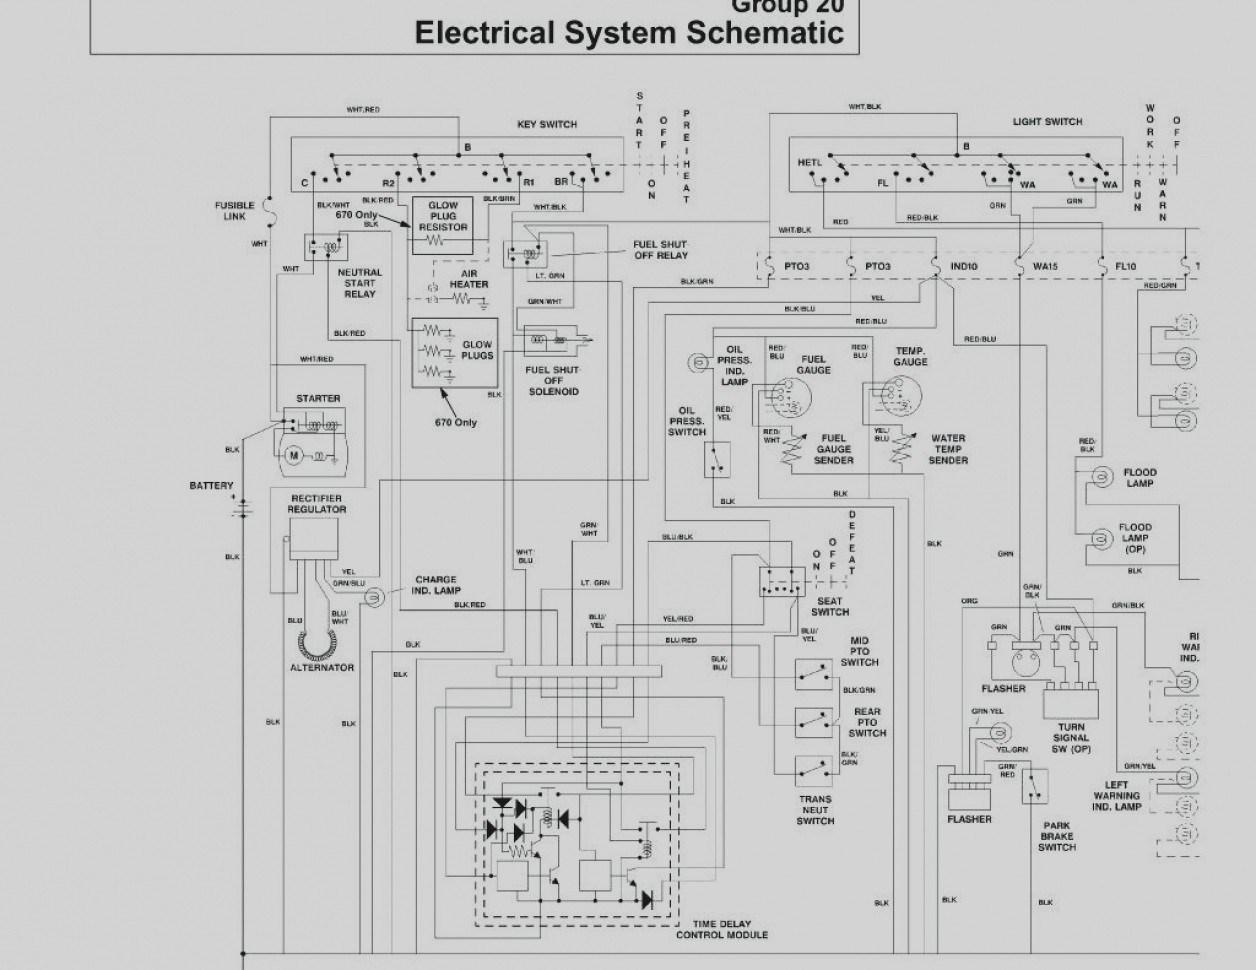 [QMVU_8575]  ST_2407] 1086 Wiring Diagram Wiring Diagram | International 574 Wiring Diagram |  | Jidig Kapemie Mohammedshrine Librar Wiring 101